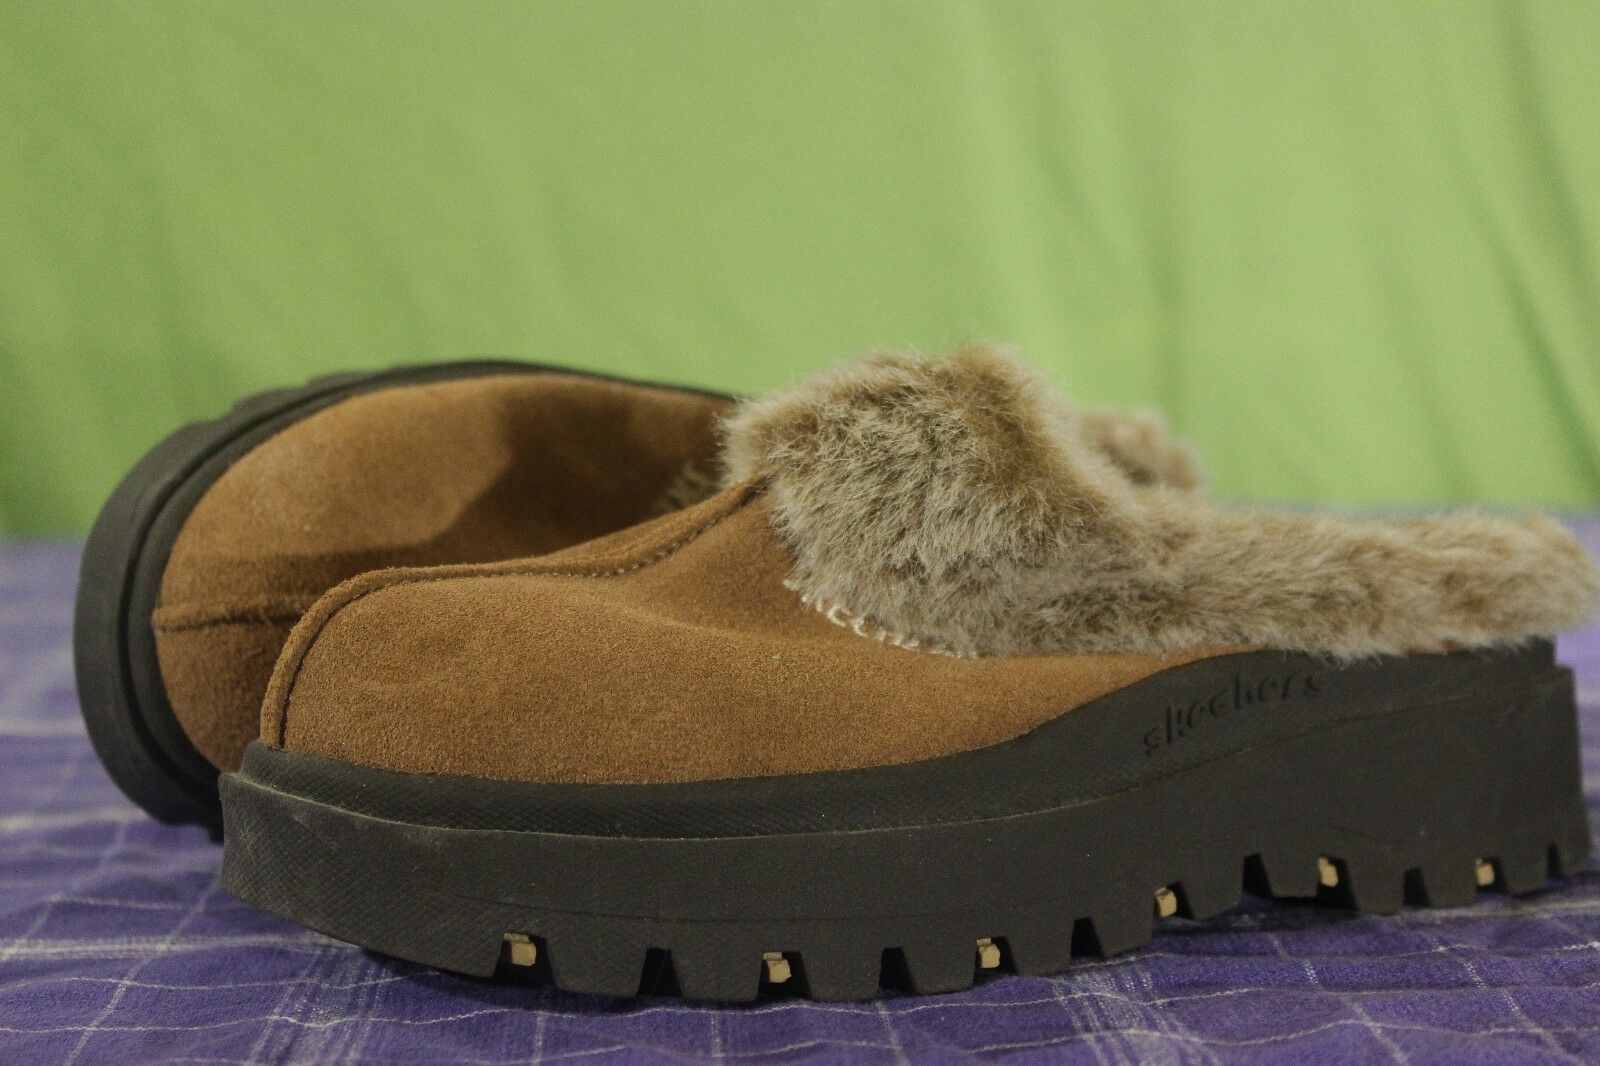 Fuzzy Slip Platform On Shoes Slippers Shindigs Sz 6.5 Platform Slip Skechers Fortress Brown 85b1ff